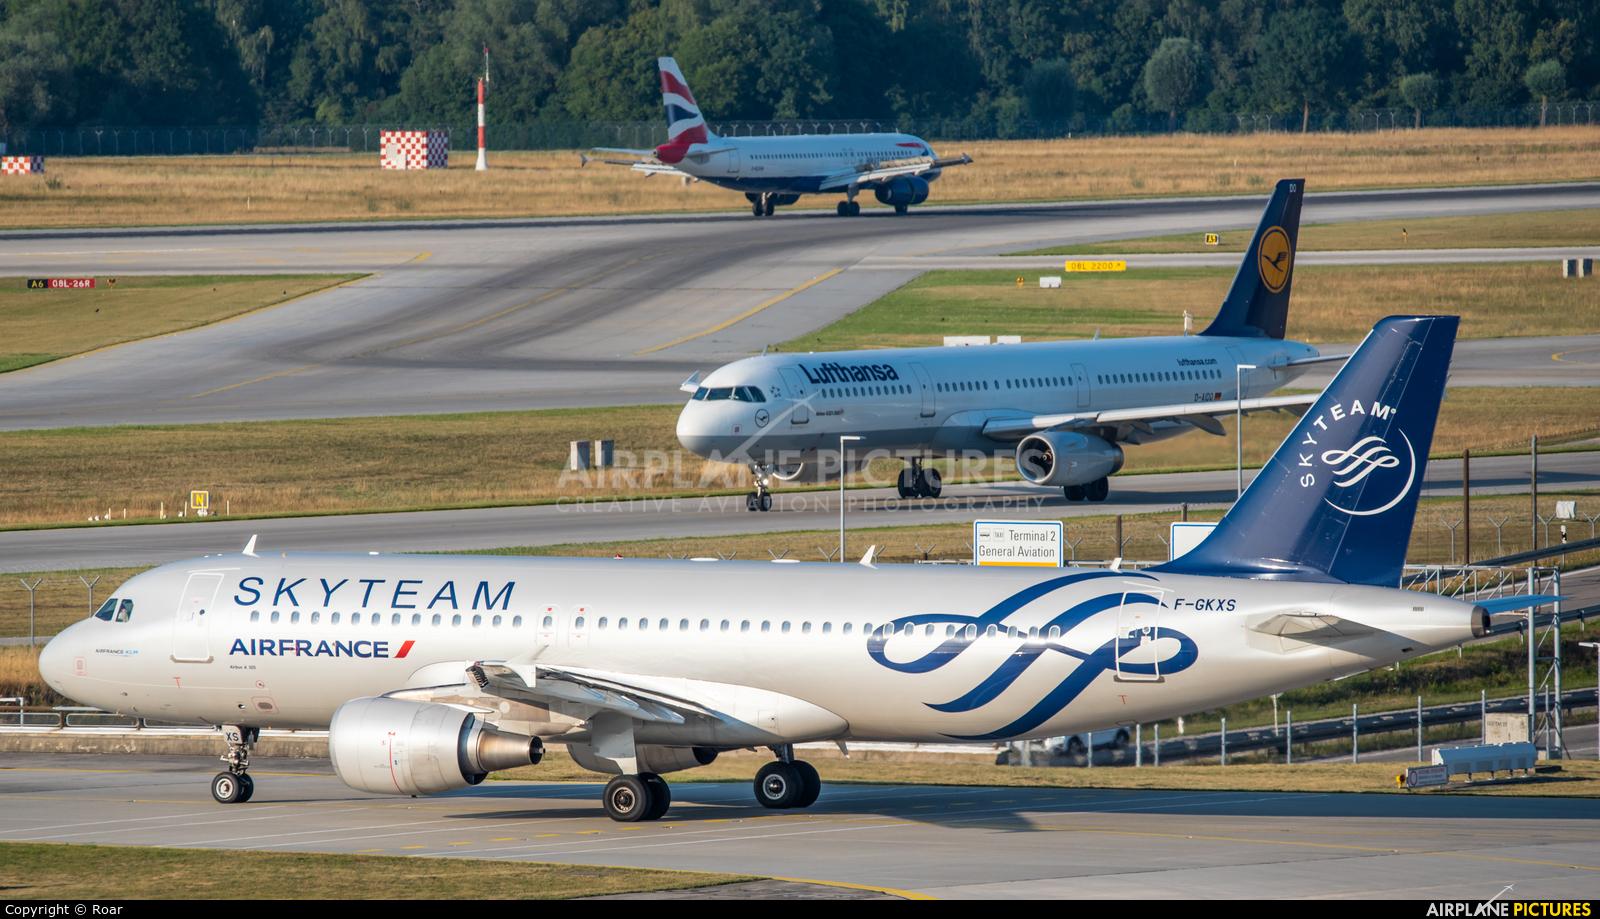 Air France F-GKXS aircraft at Munich